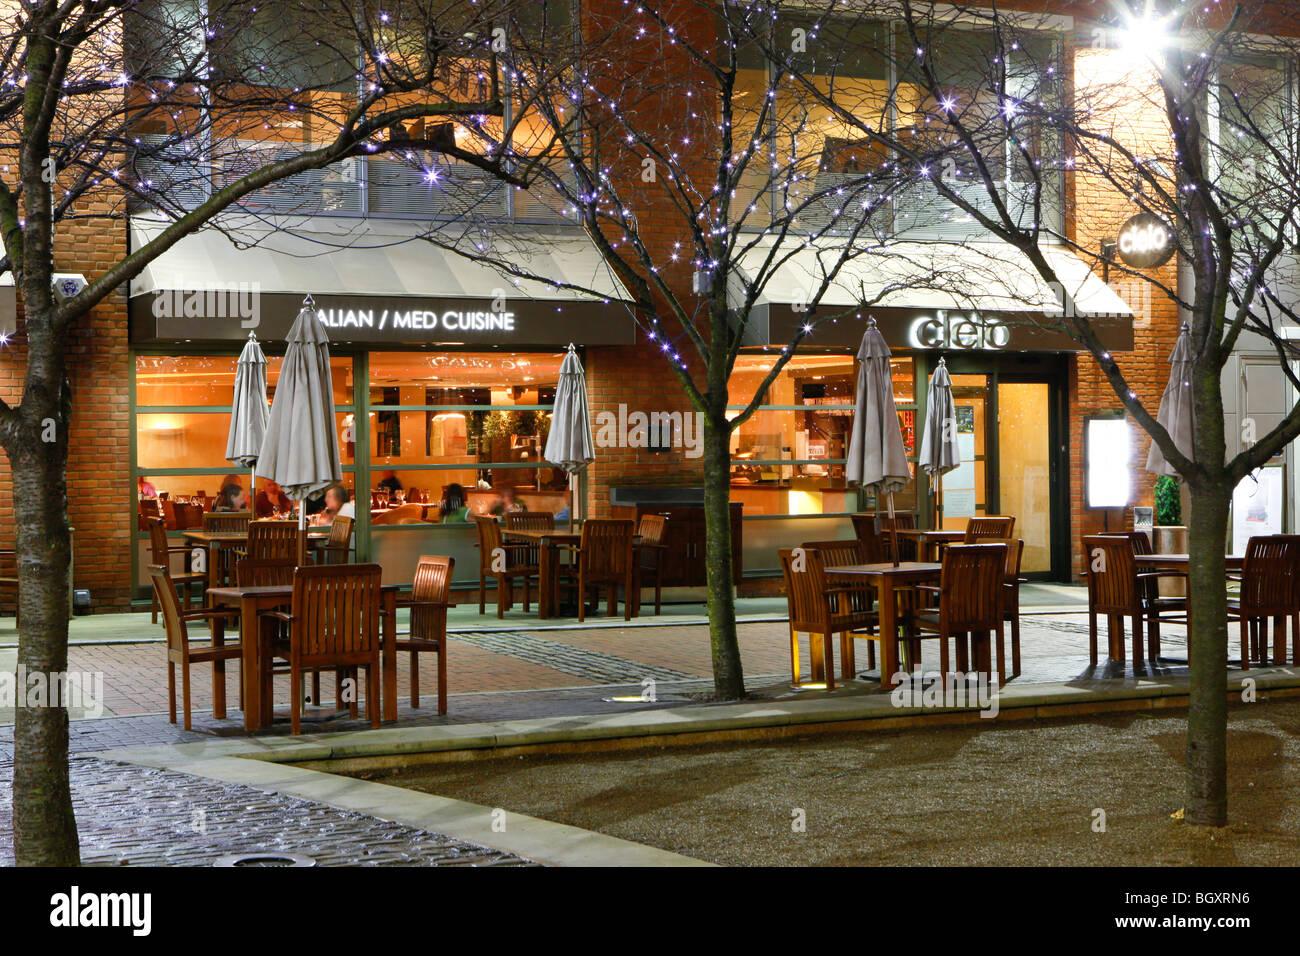 Cielo ristorante a Brindleyplace, Birmingham. Immagini Stock